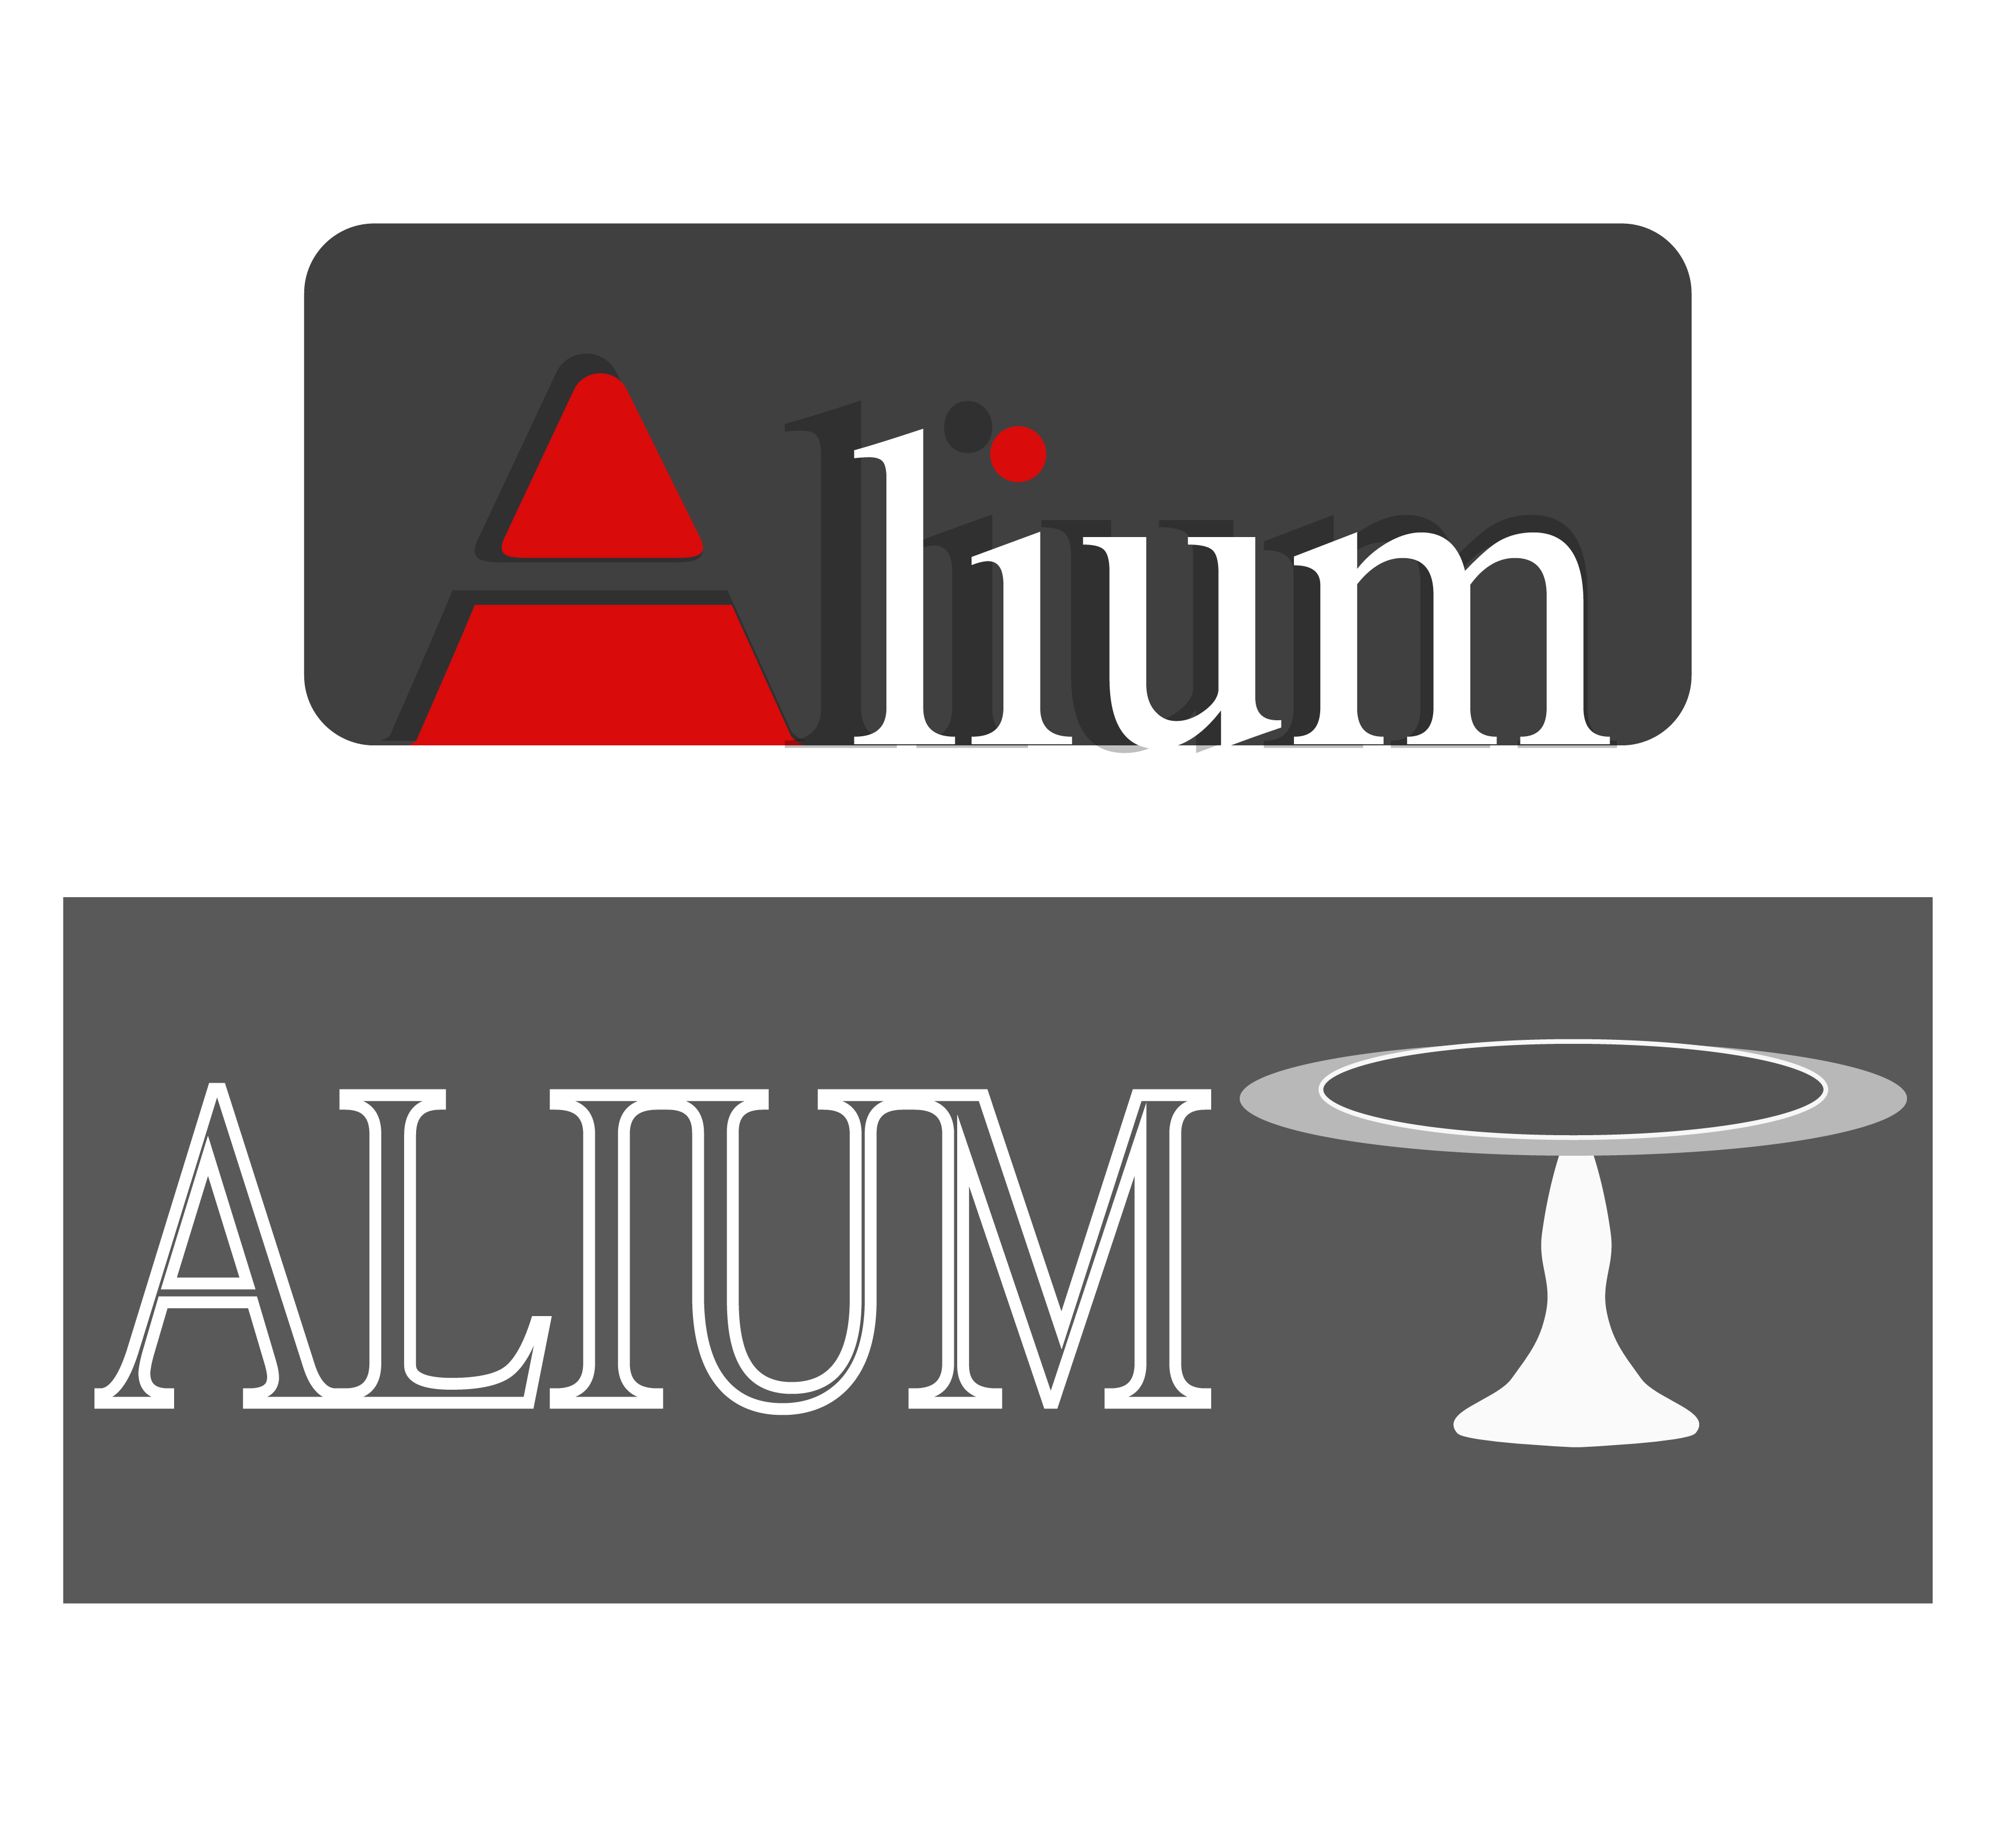 Логотип для дизайн студии фото f_43359e789d11bf78.jpg